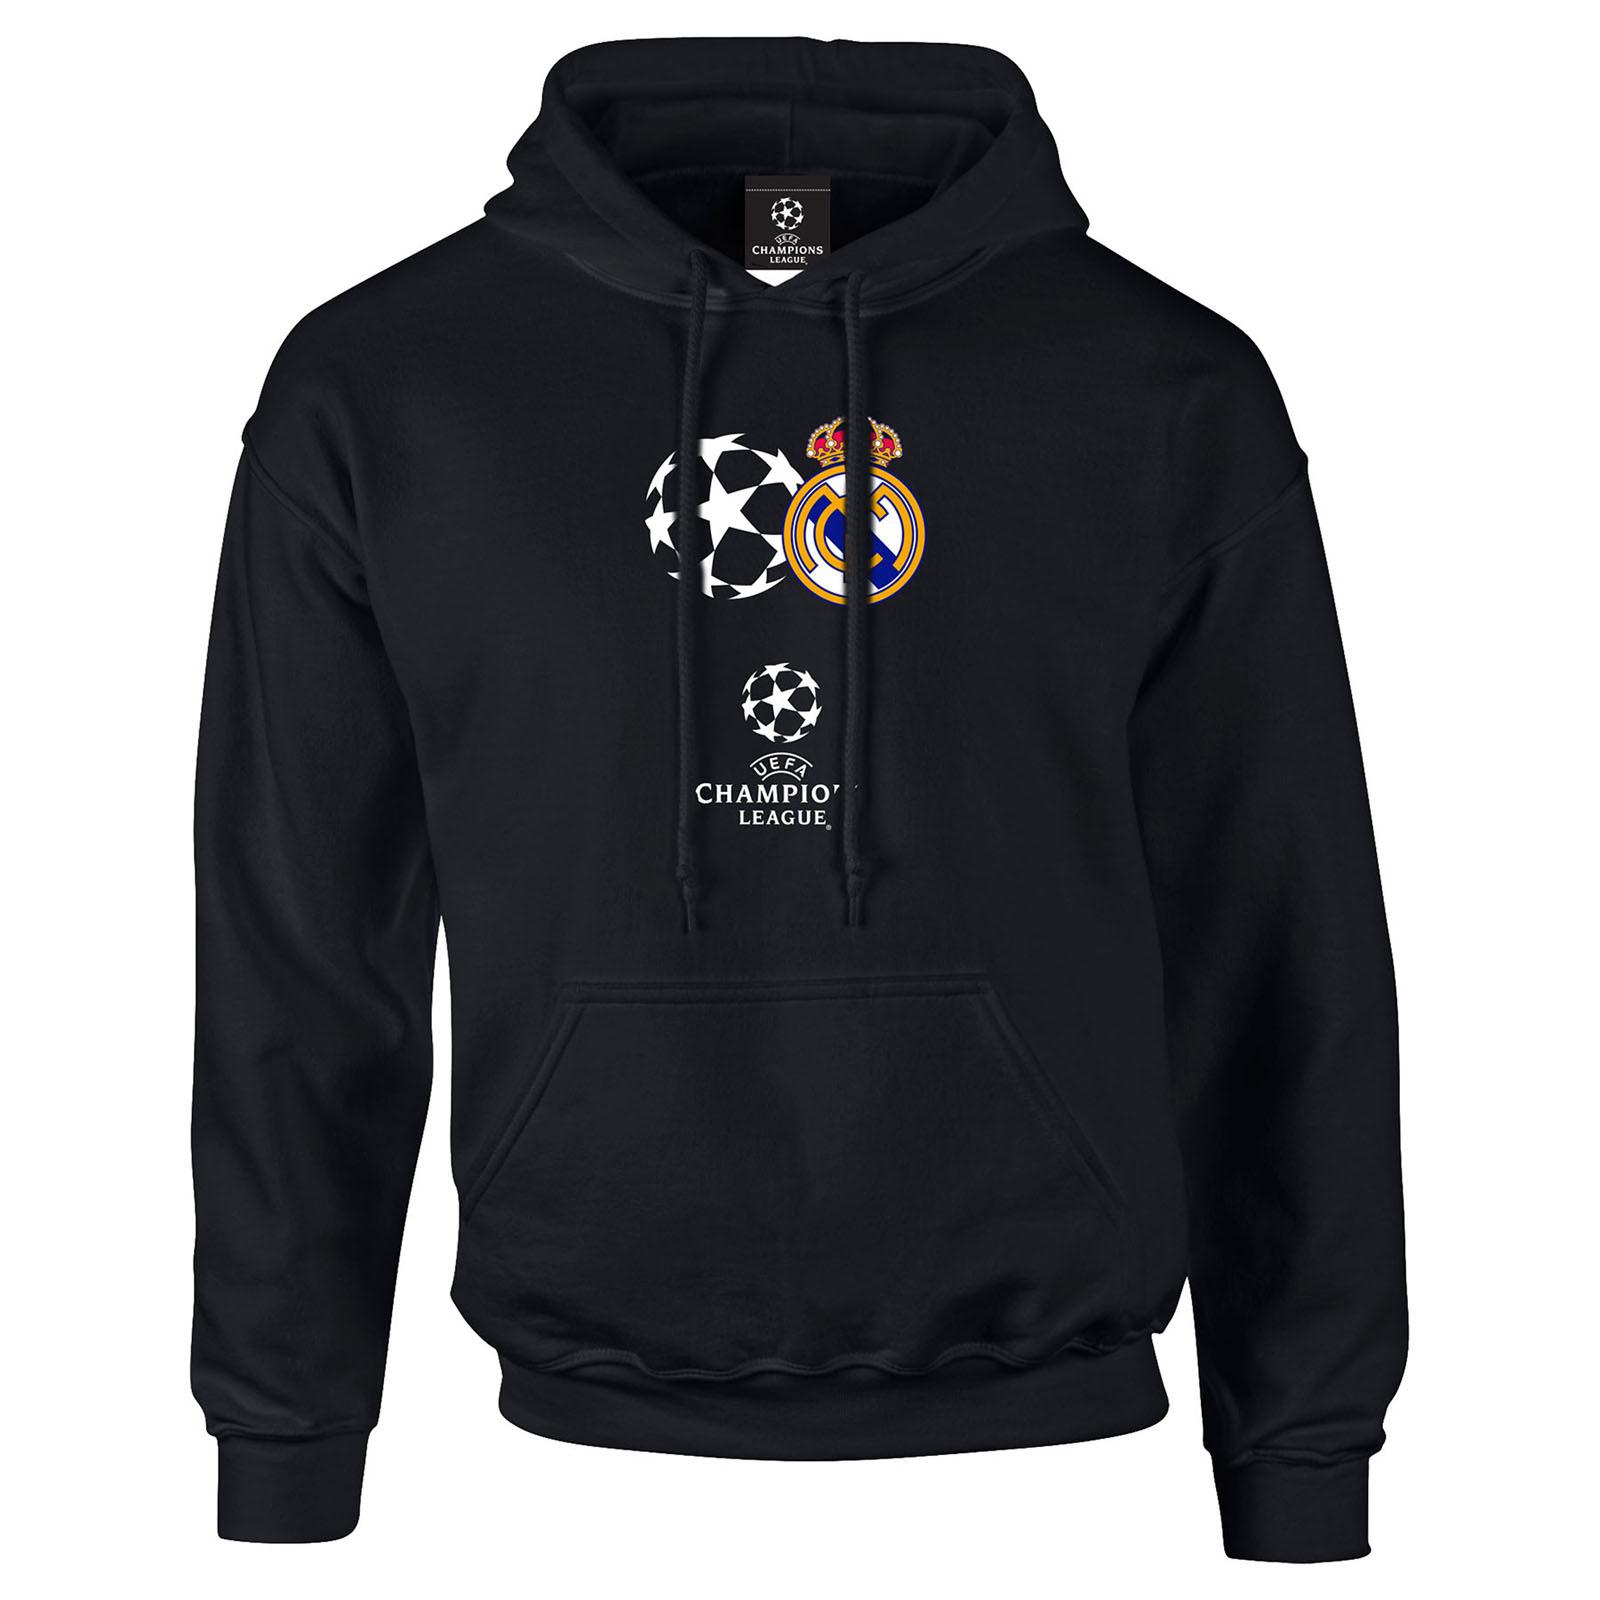 Real Madrid UEFA Champions League Hoodie - Black - Mens